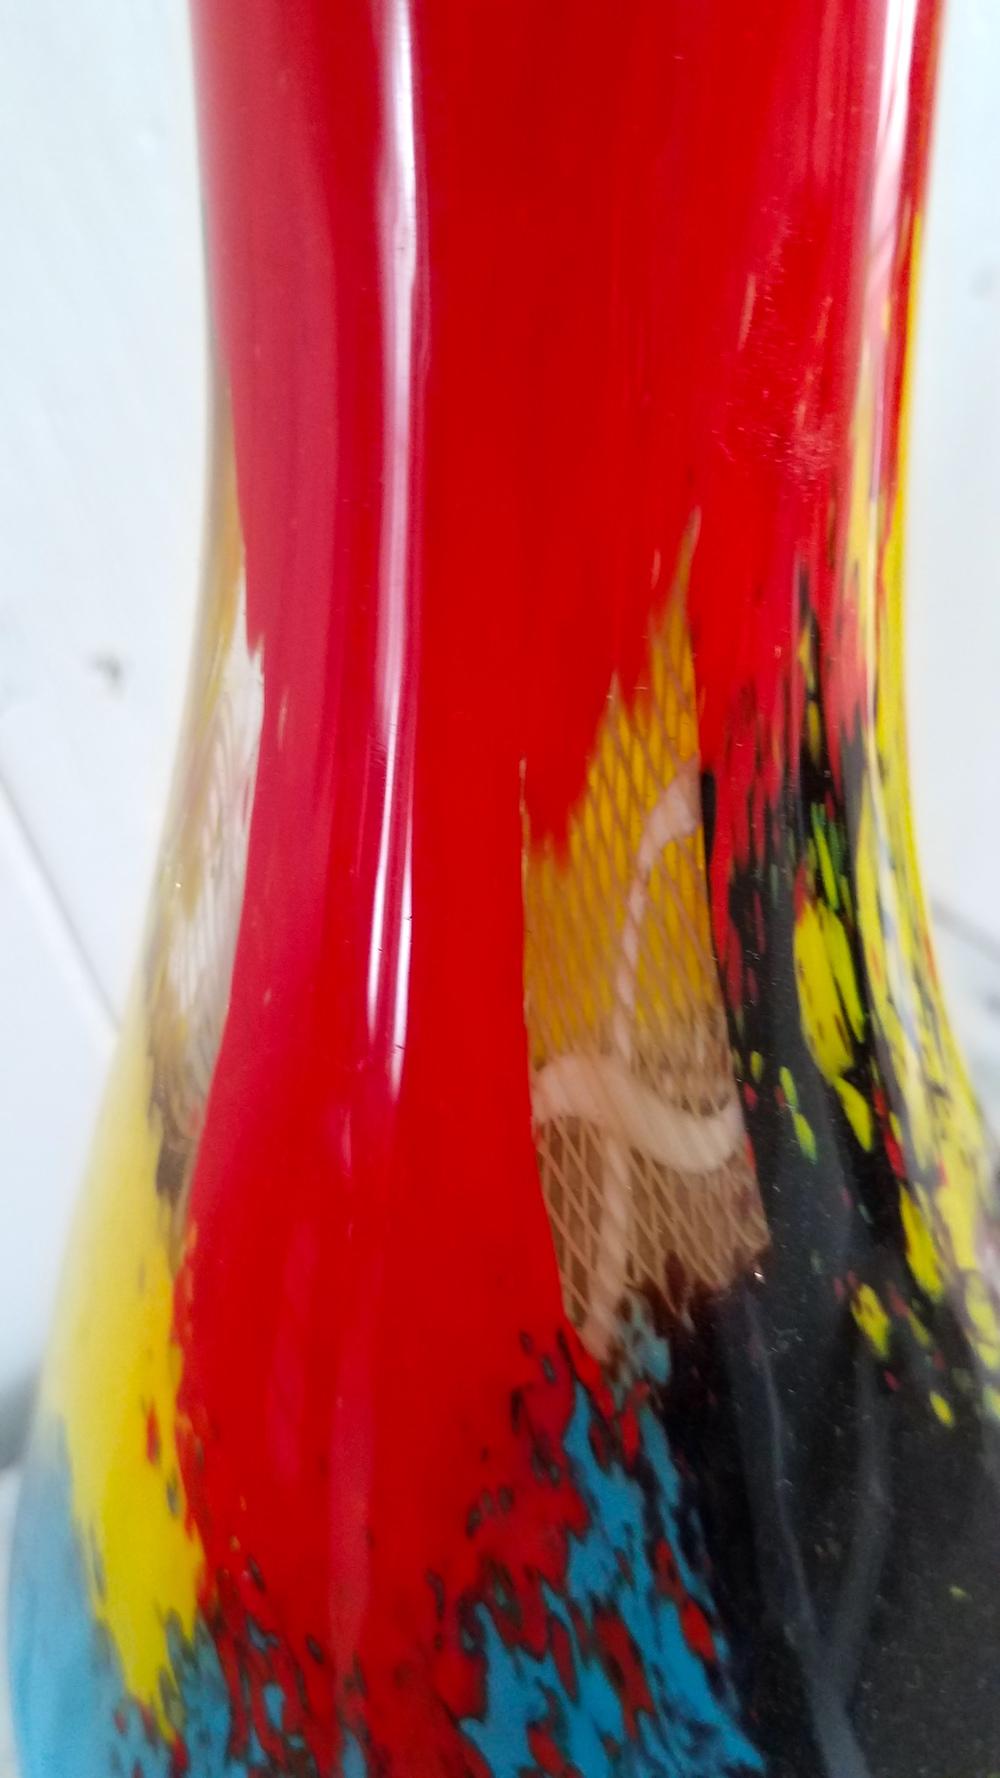 Martin-Vase-10.jpg